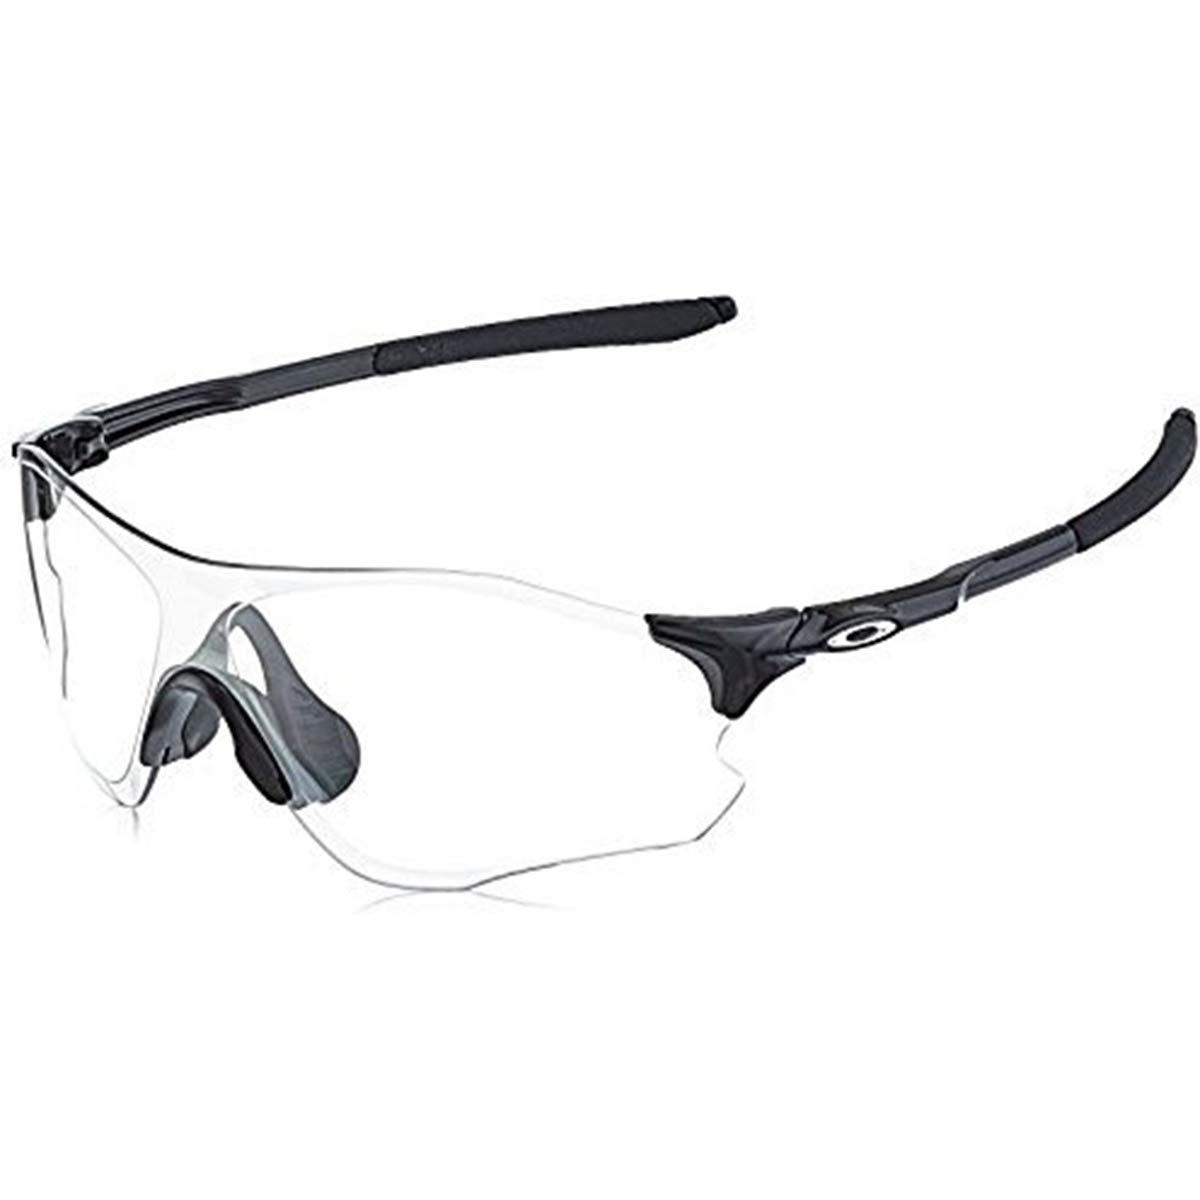 Oakley Men's OO9308 EVZero Path Shield Sunglasses, Polished Black/Clear To Black Photochromic, 38 mm by Oakley